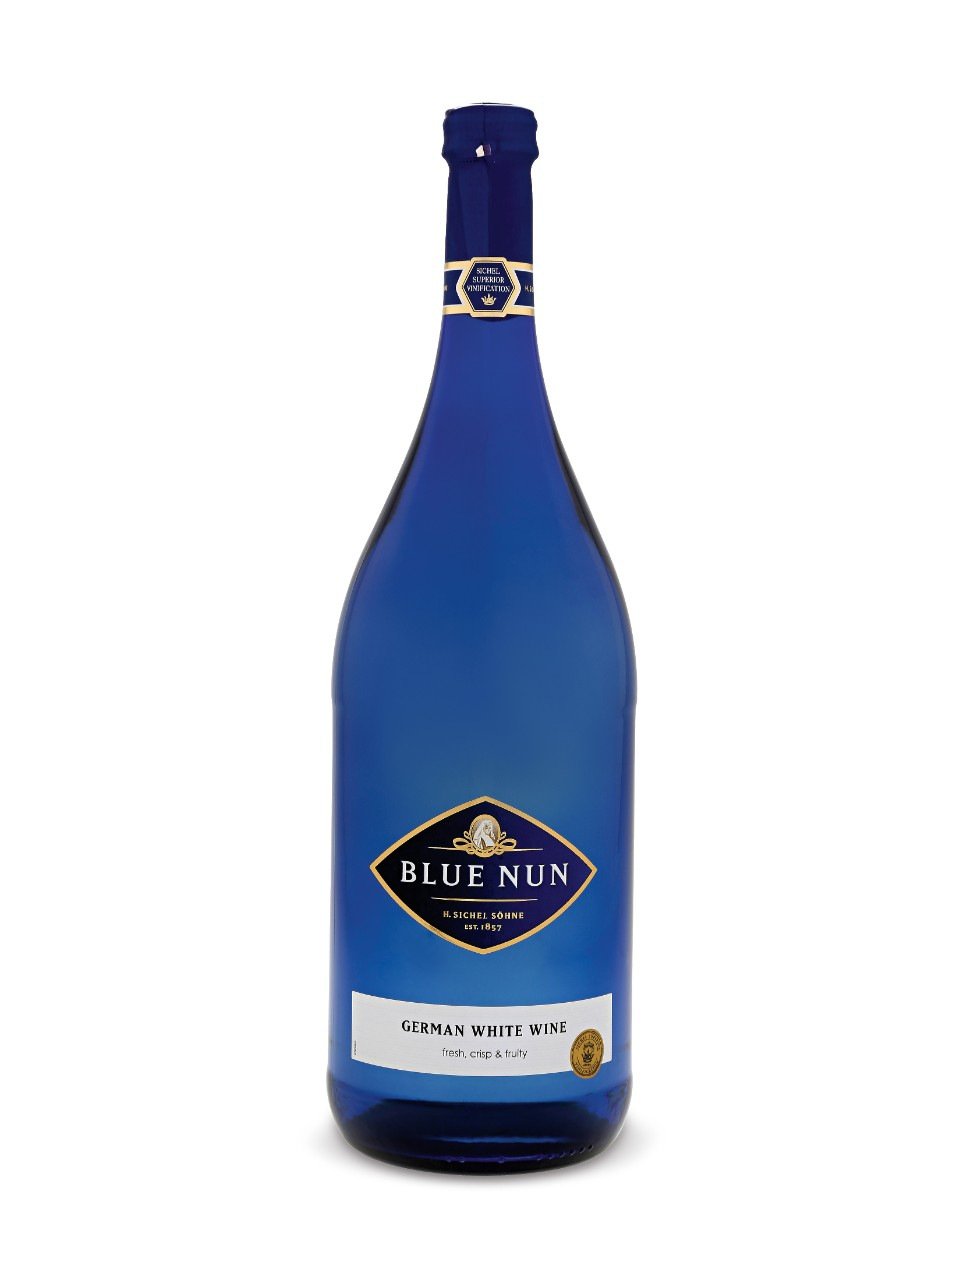 Megalomaniac Wines Homegrown Riesling 2015 Niagara Ontario Vqa Canada Natalie S Score 87 100 Http Www Nataliemaclean Com Riesling Homegrown Wine Bottle